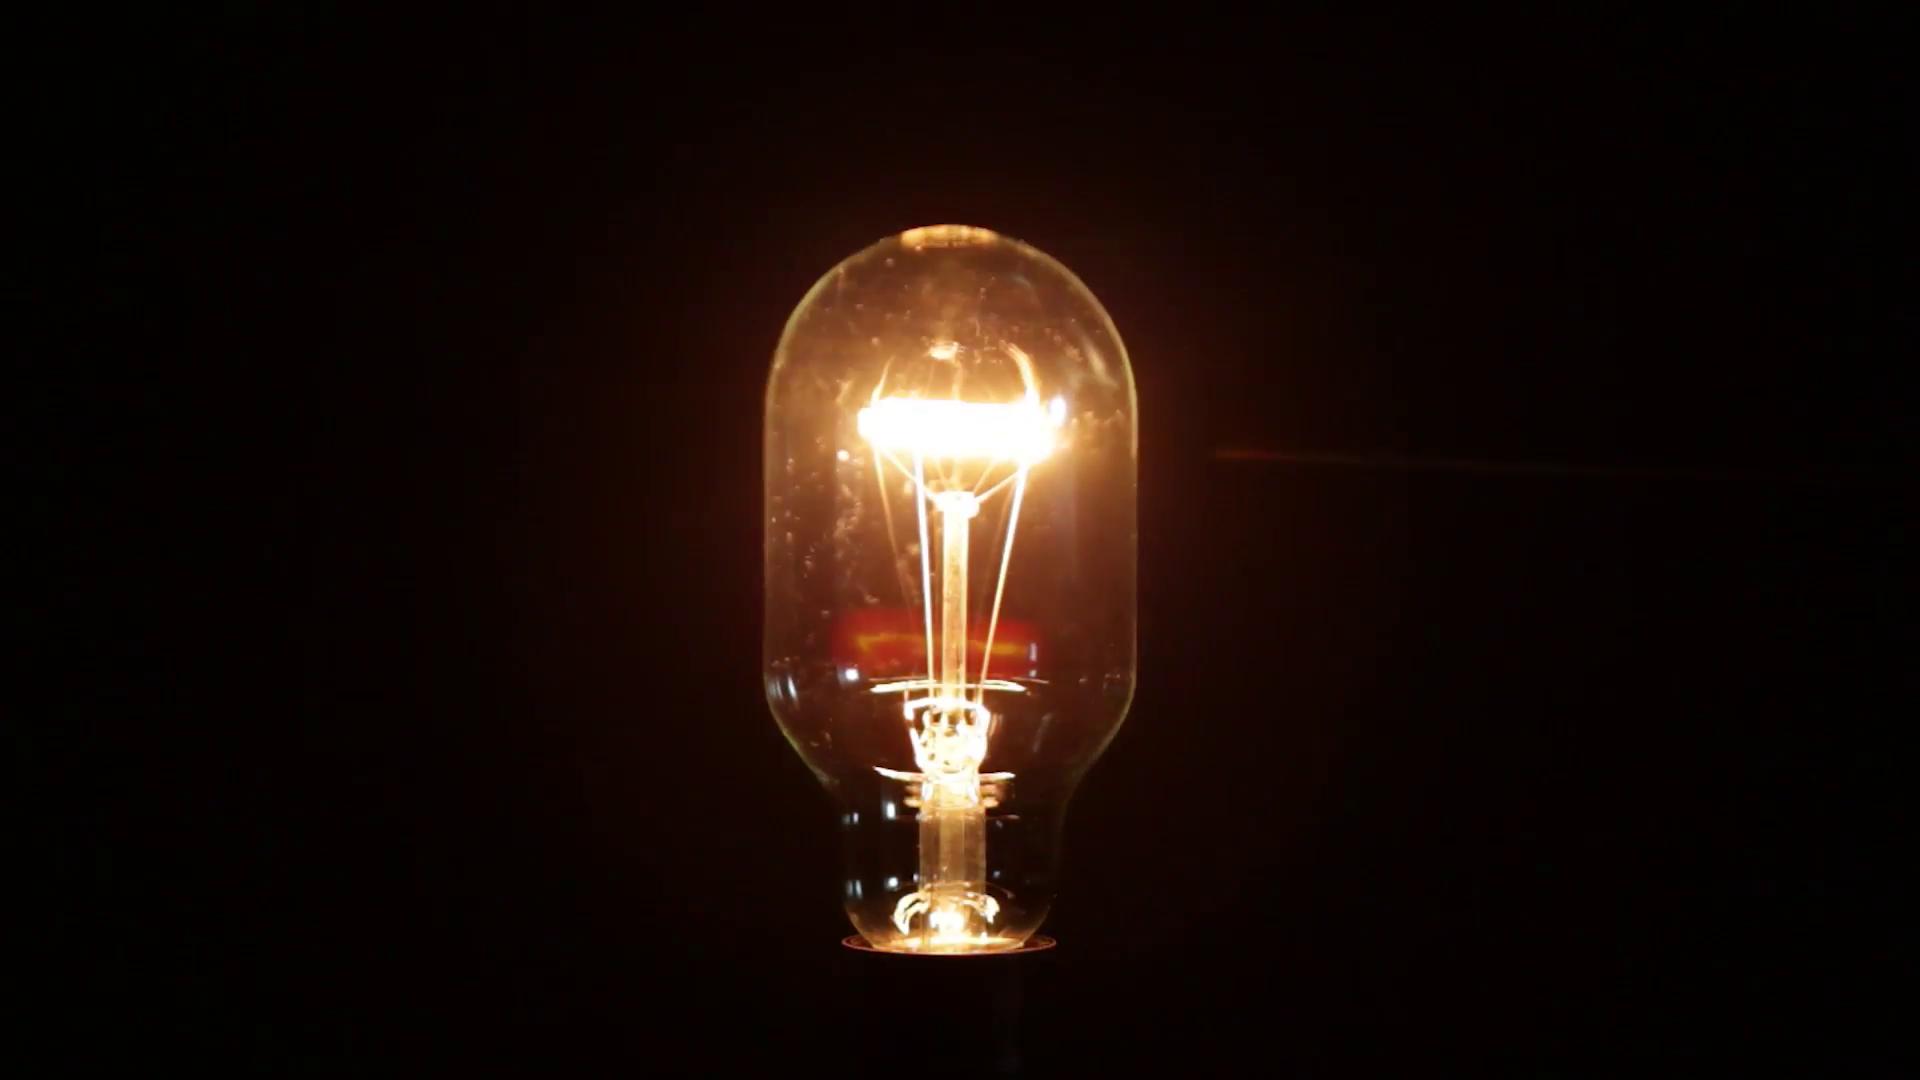 Light bulb closeup photo